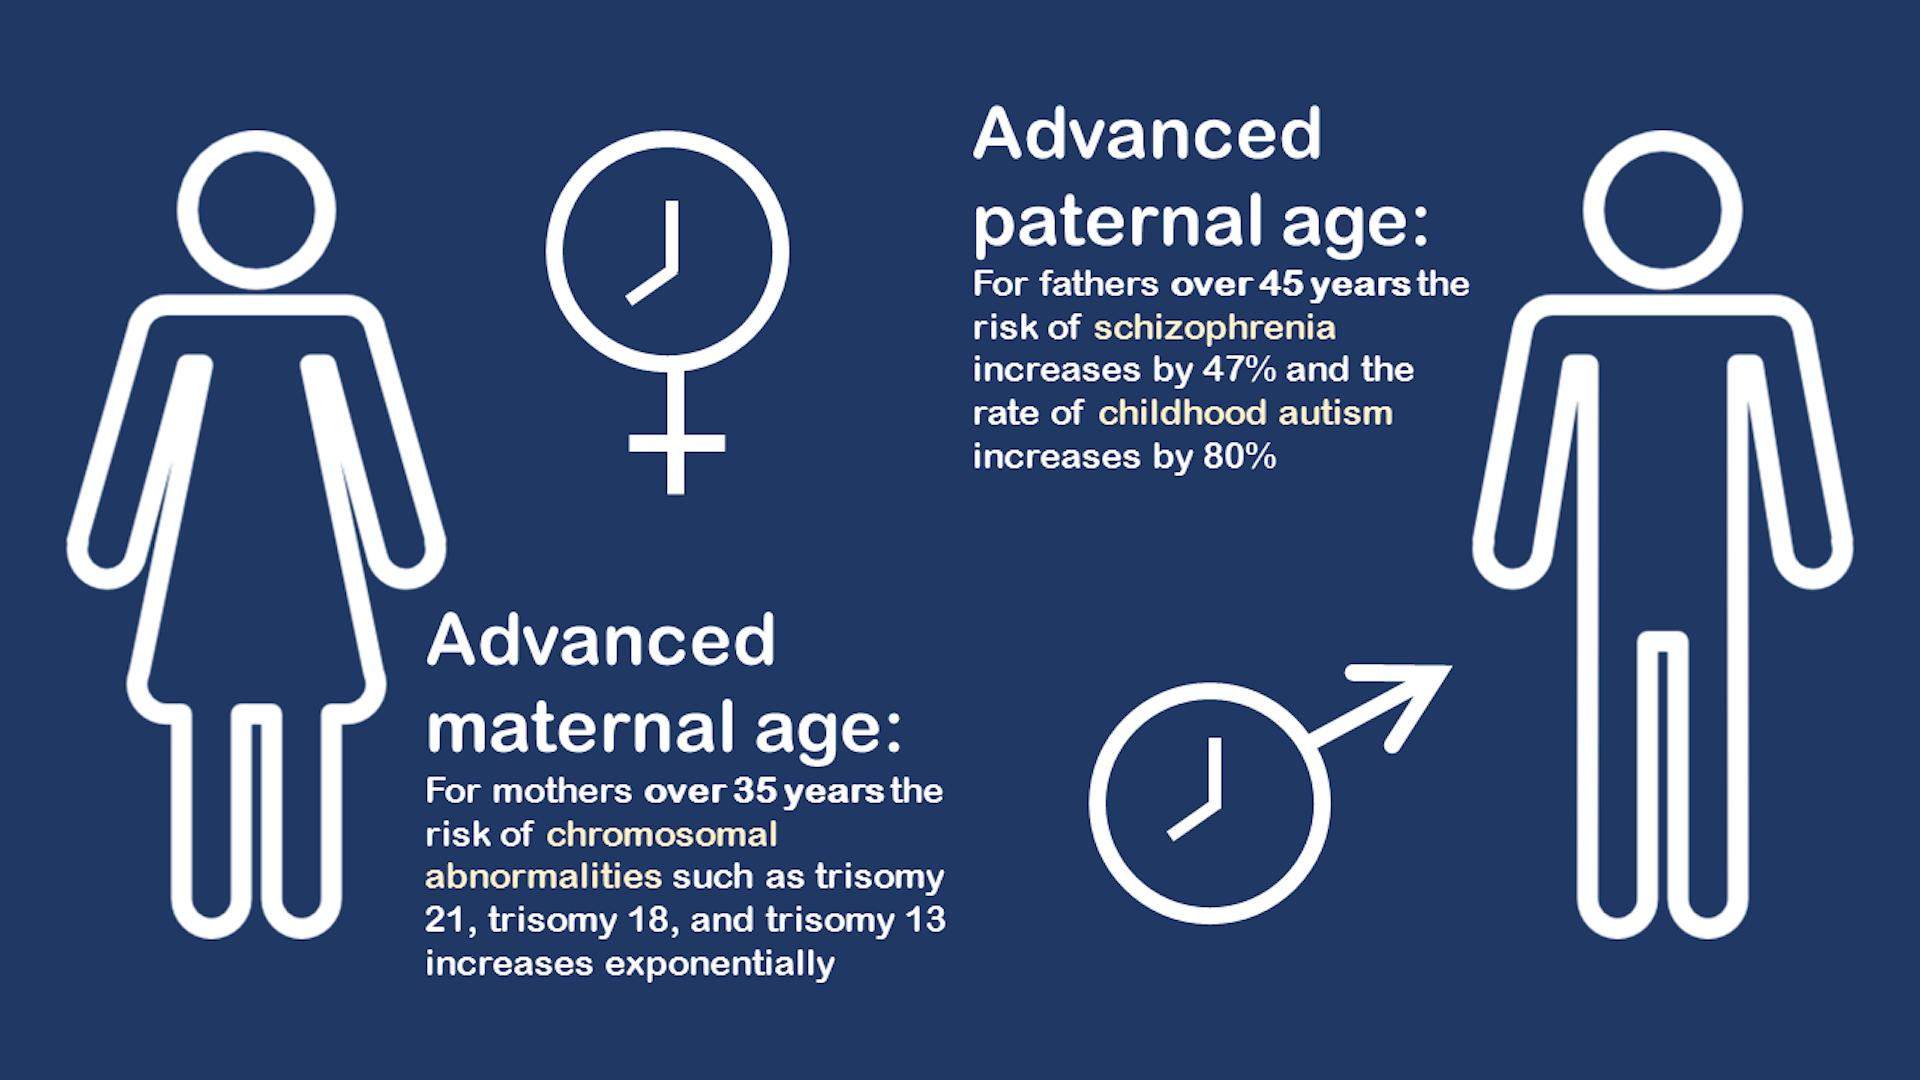 edad optima para tener hijos mujer